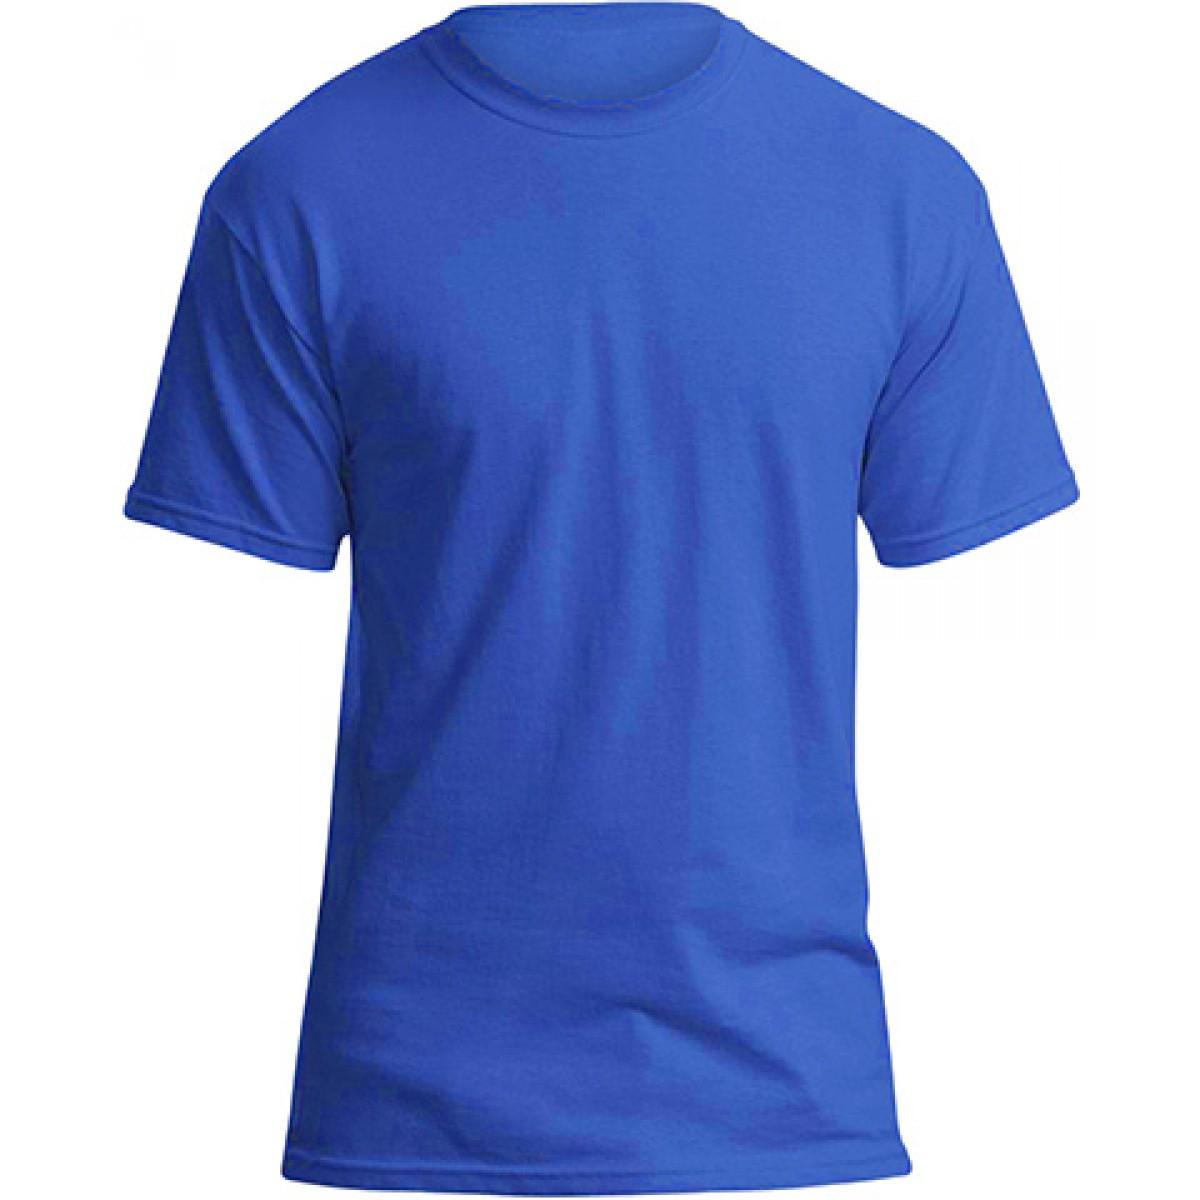 Soft 100% Cotton T-Shirt-Royal Blue-XL